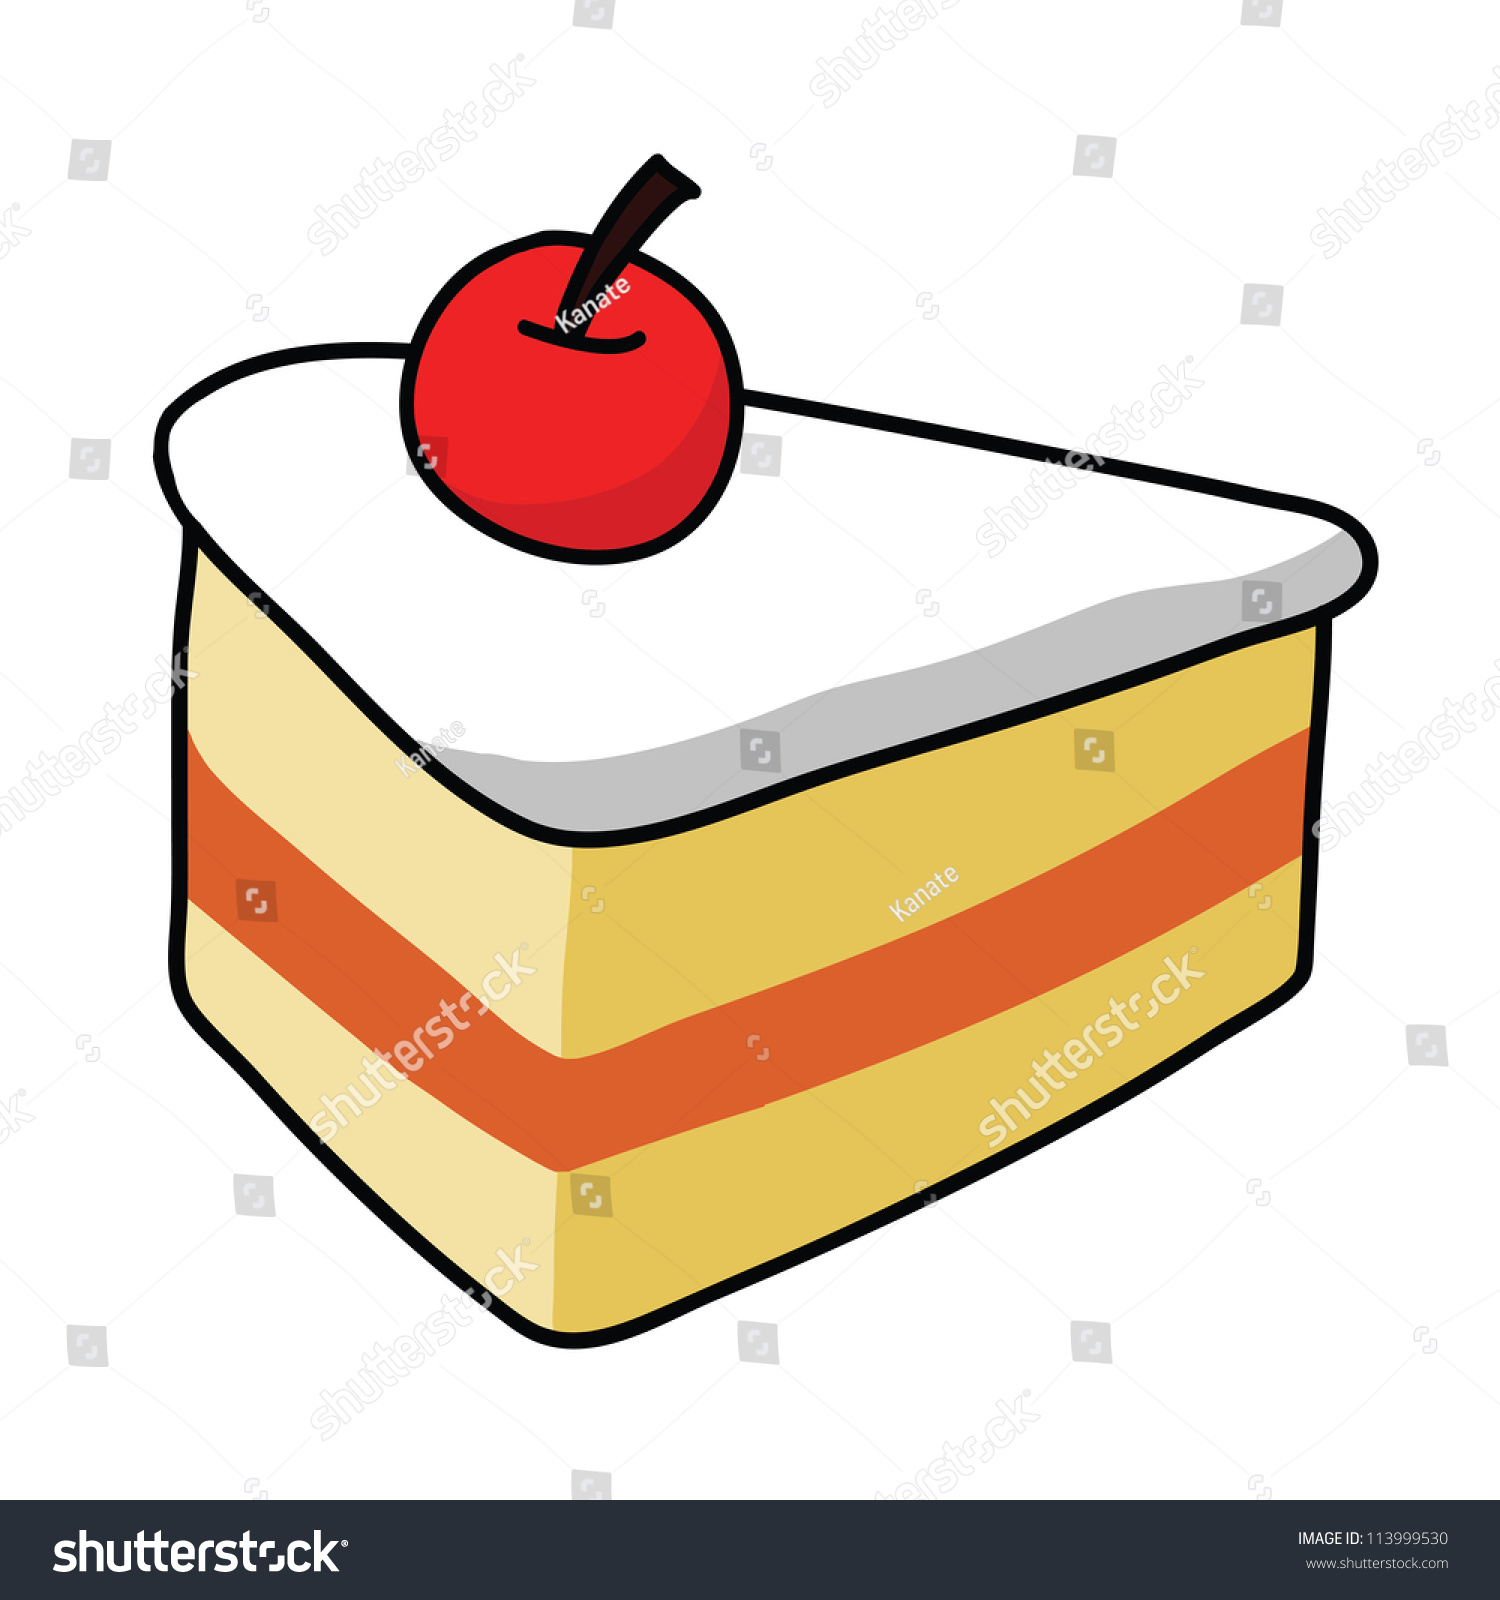 Cake Slice Cartoon Images : Cartoon Cake Stock Vector 113999530 - Shutterstock